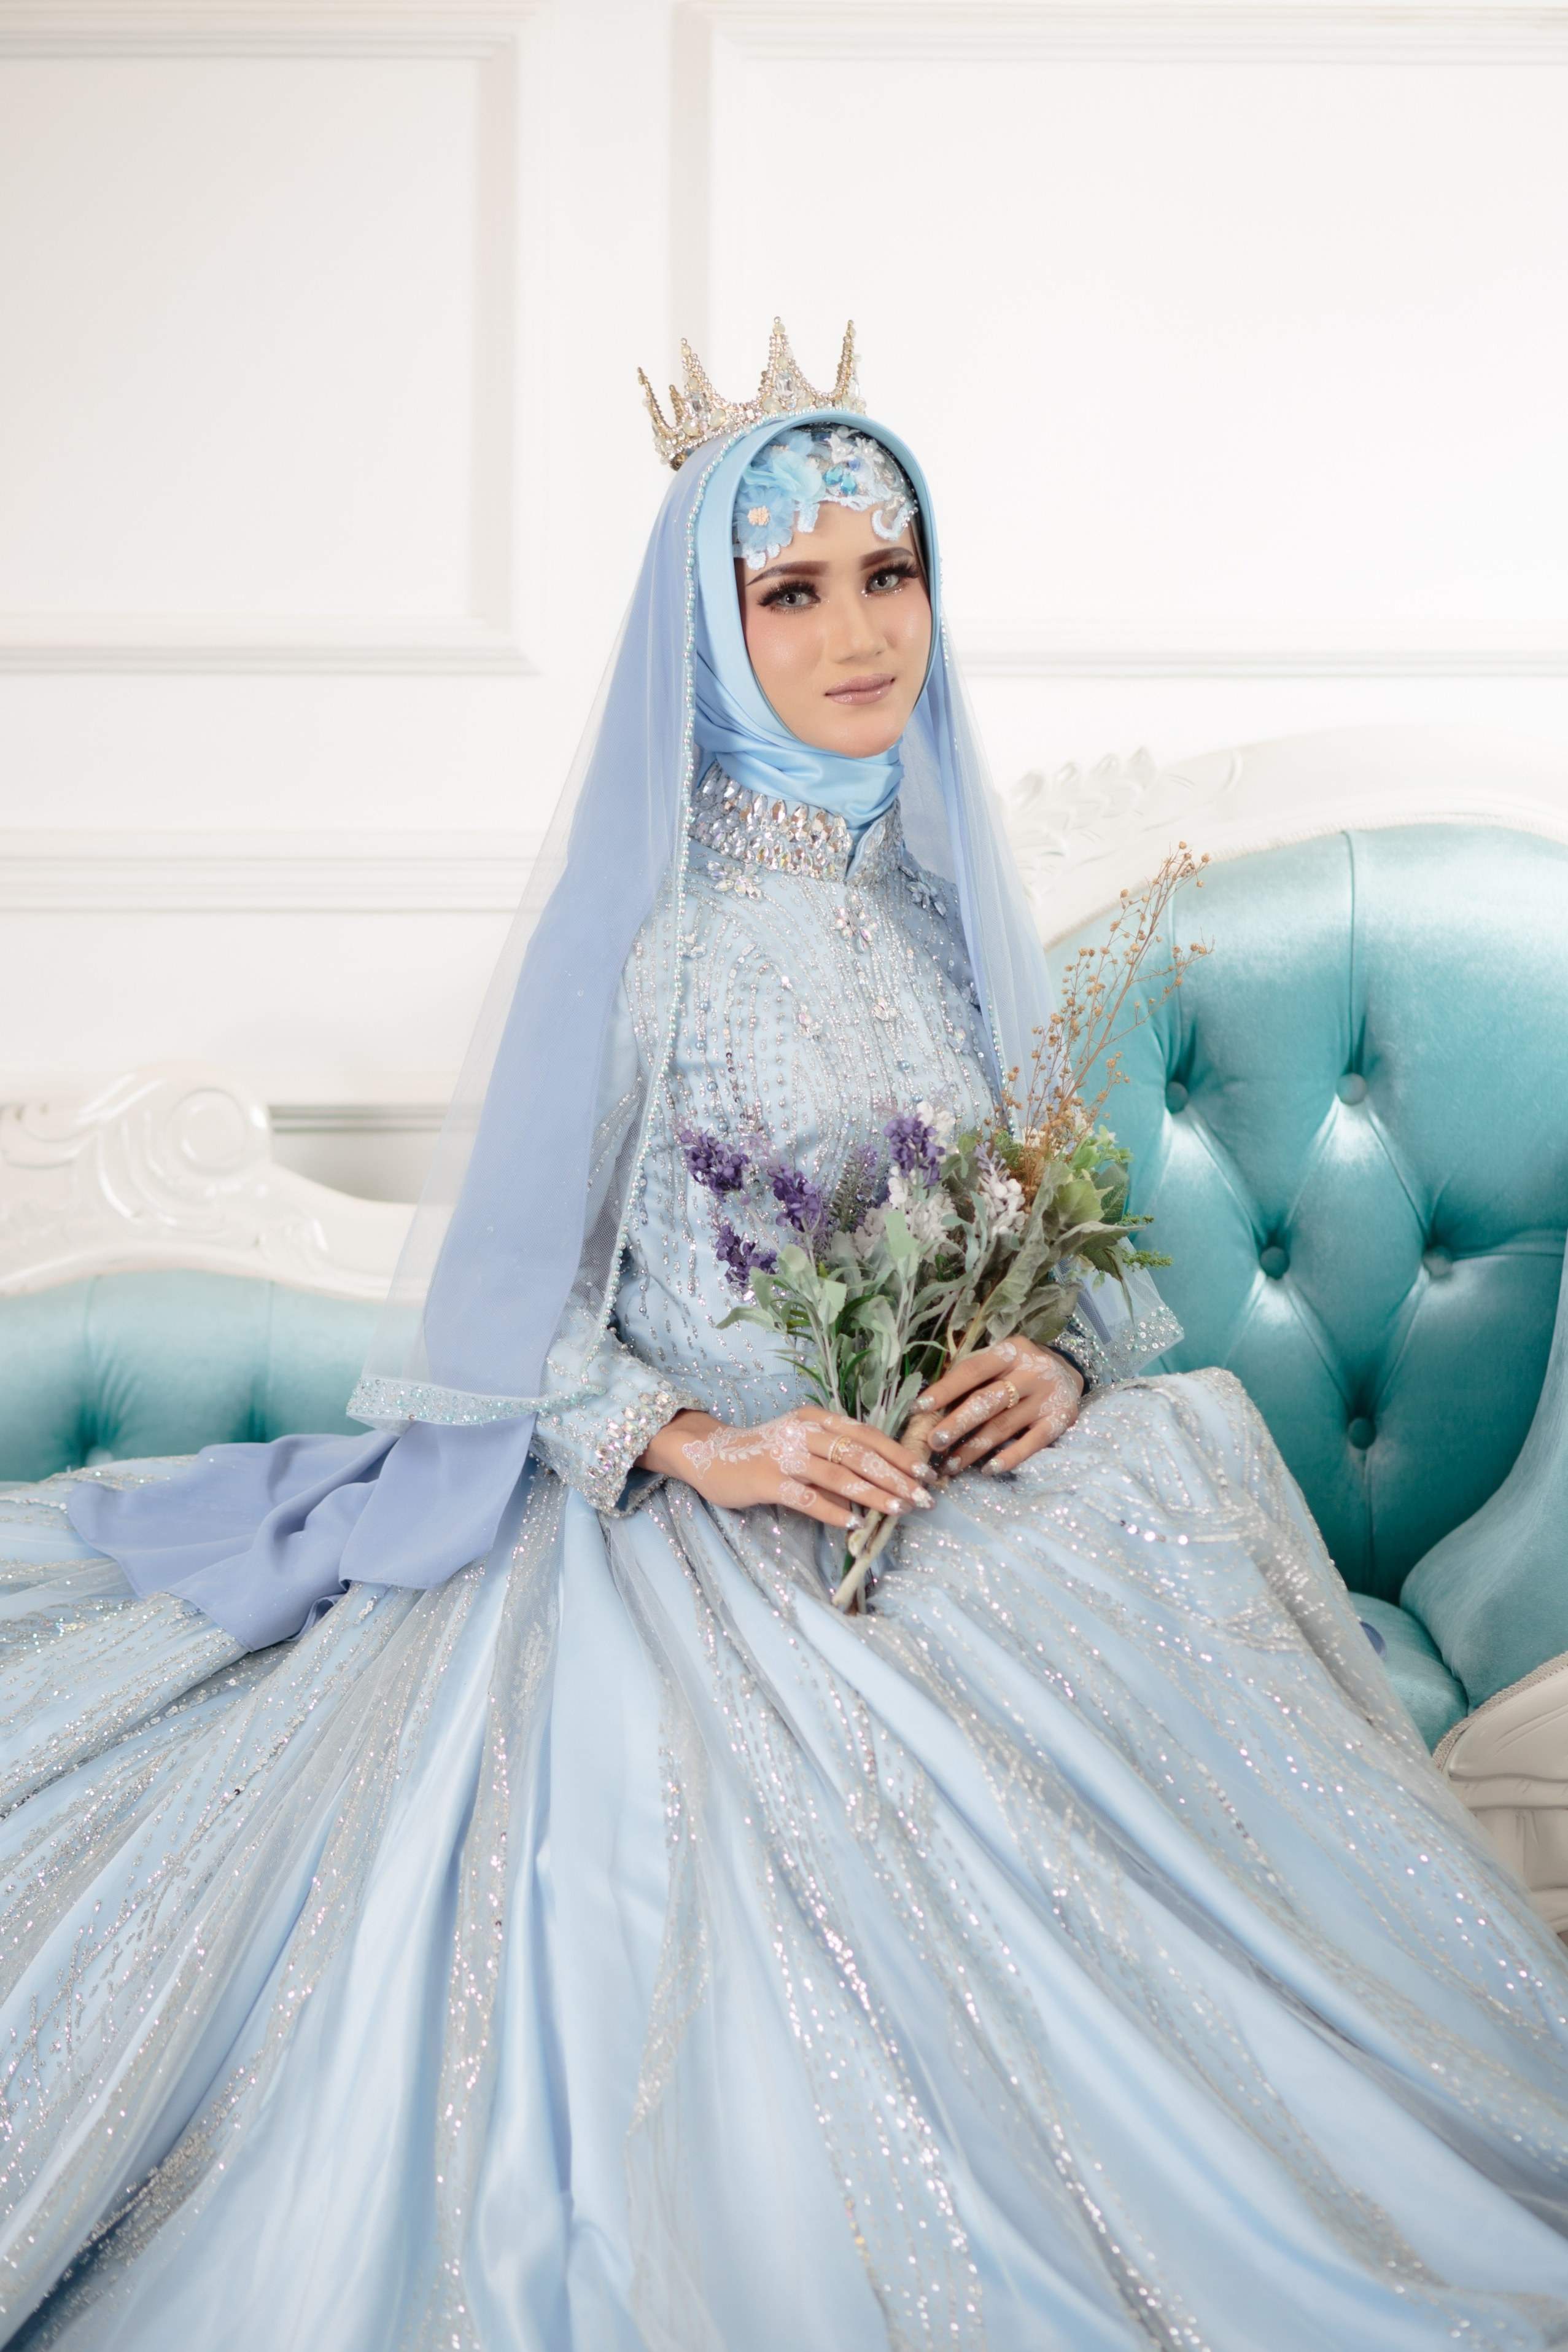 Model Gaun Pengiring Pengantin Muslim Whdr Model Gaun Pengantin Wow Model Busana Muslim 2019 Contoh